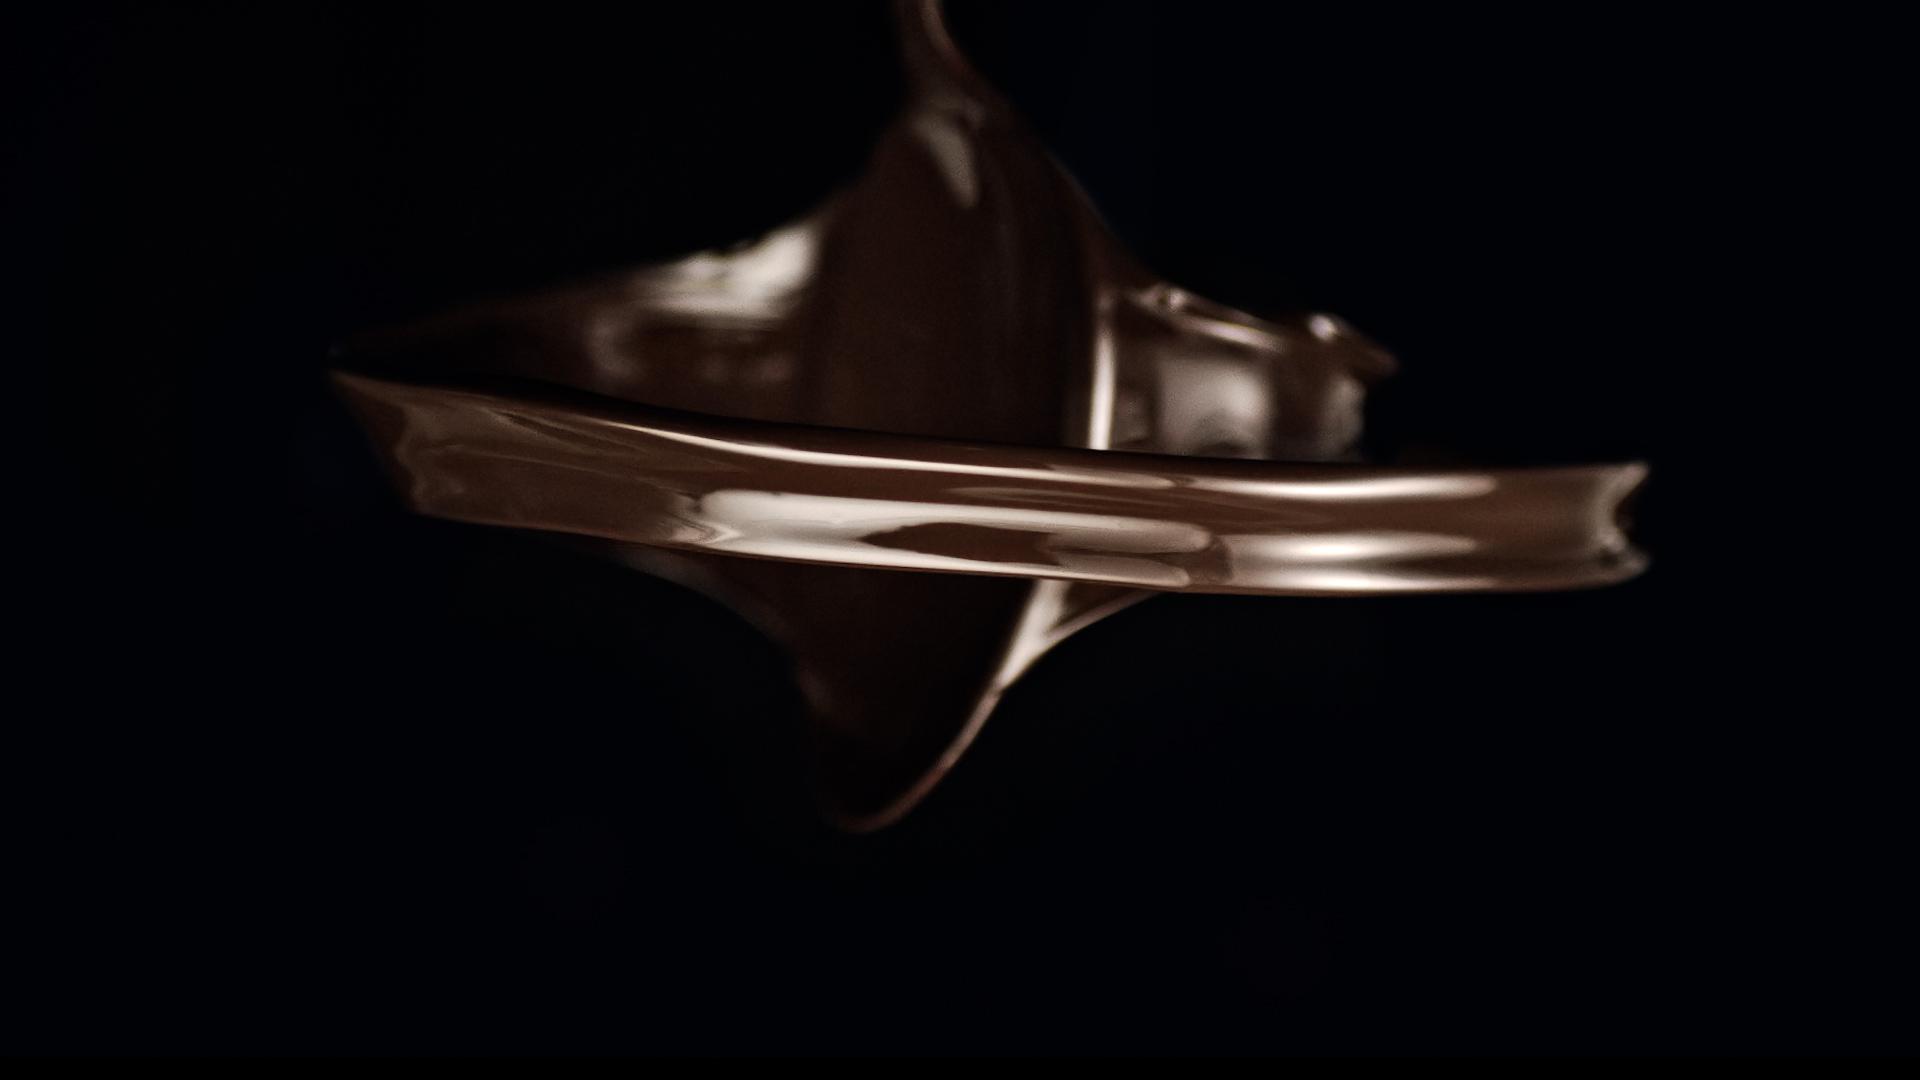 portfolio/theartofchocolate/chocolate_jorrit-stollman_13.jpg